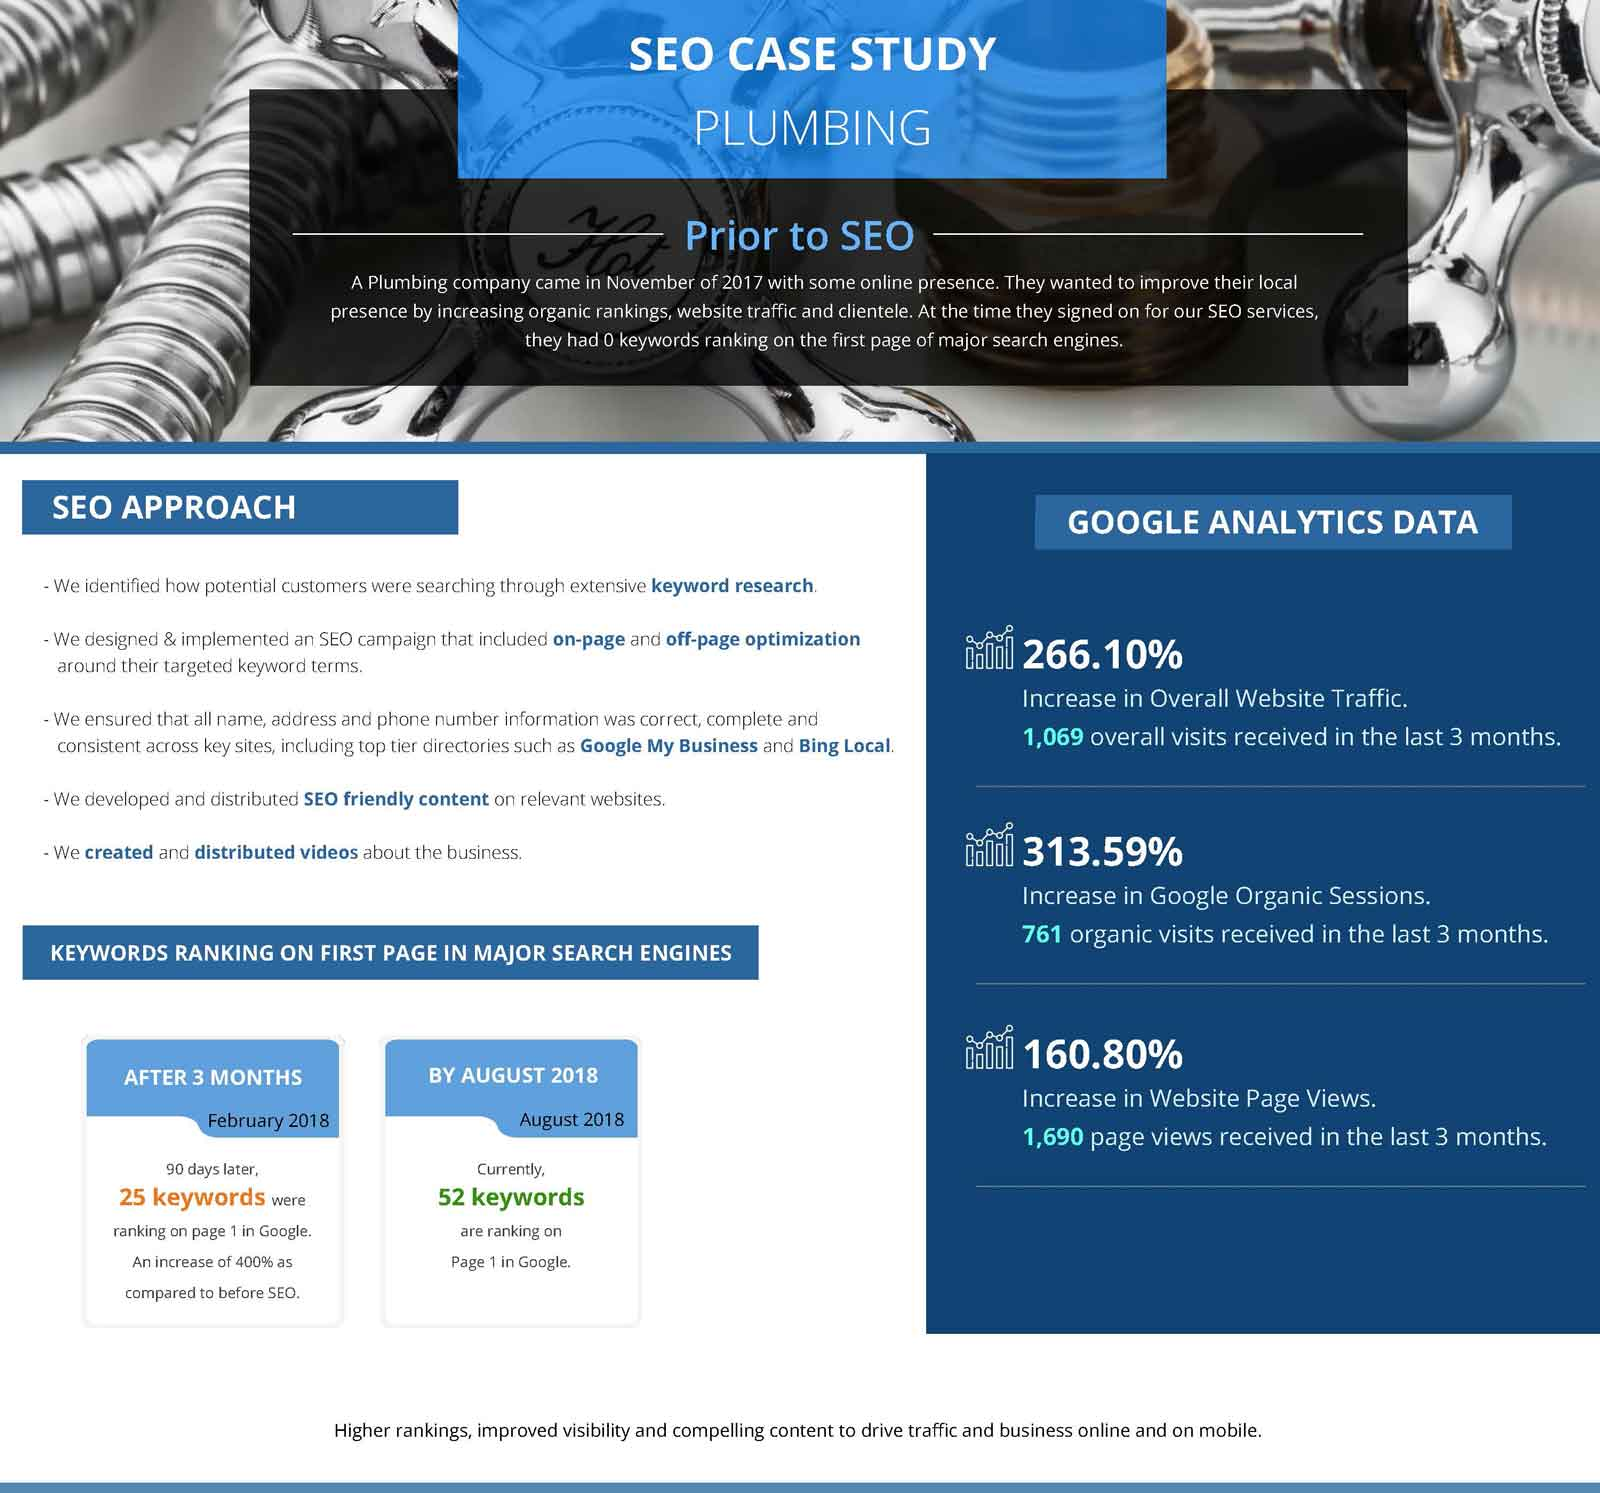 plumbing seo case study